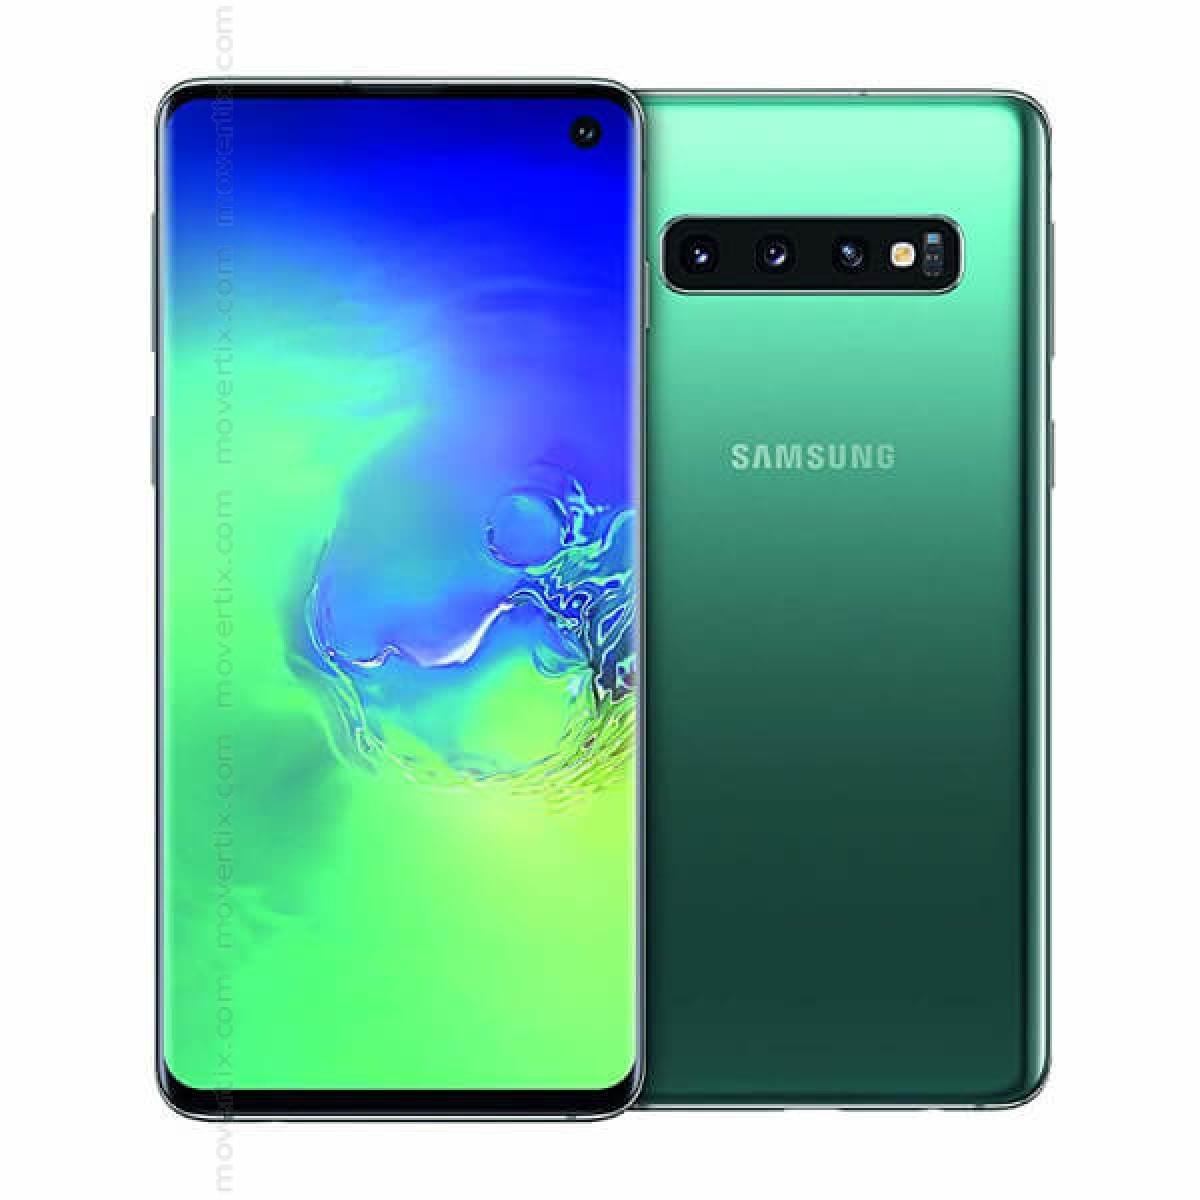 Samsung Galaxy S10 Dual SIM Prism Green 128GB and 8GB RAM (SM-G973F/DS)